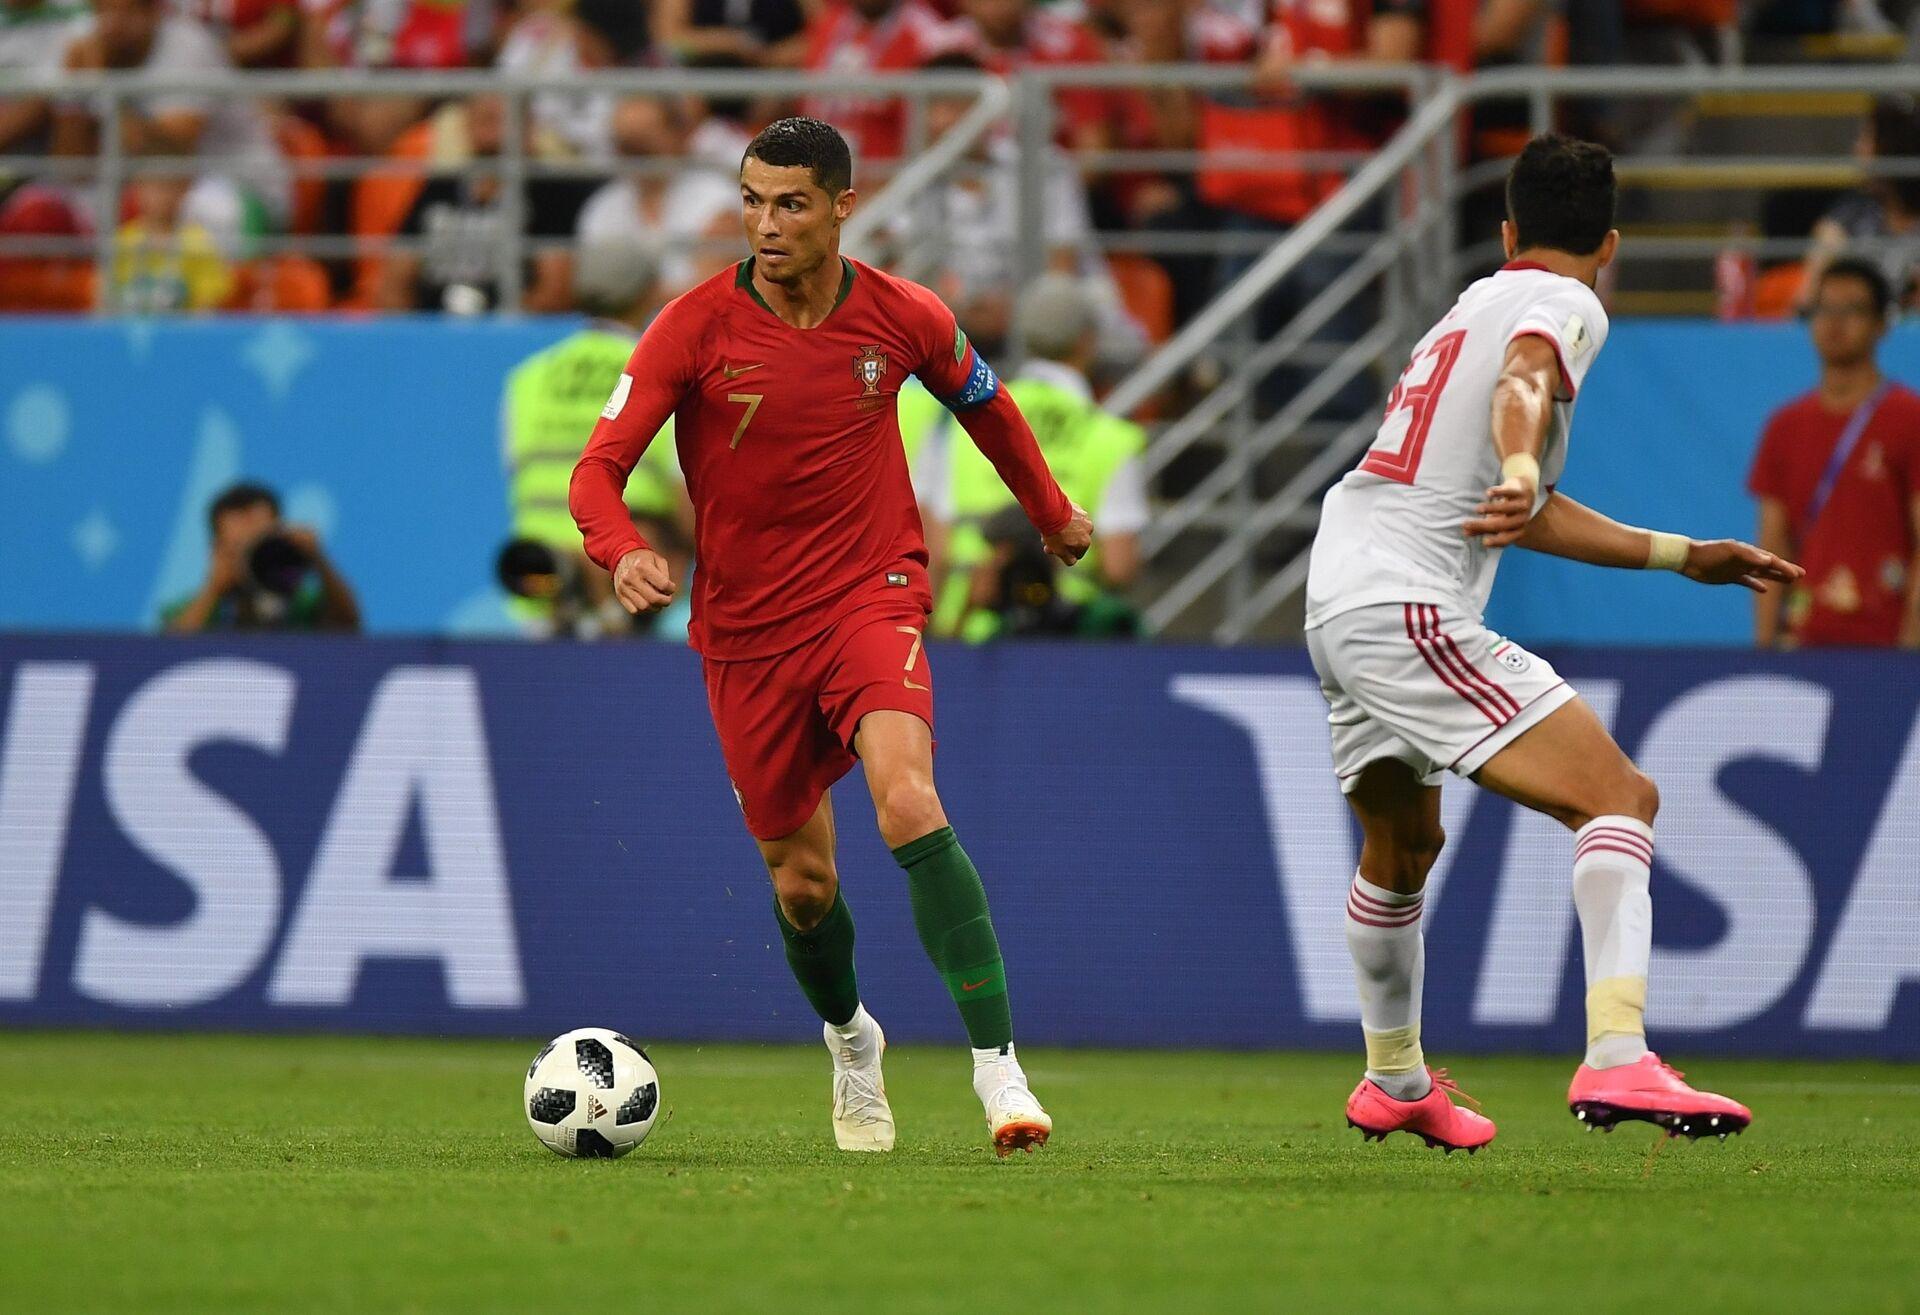 Сербия - Португалия: прогноз на отборочный матч ЧМ-2022 по футболу - Sputnik Грузия, 1920, 27.03.2021